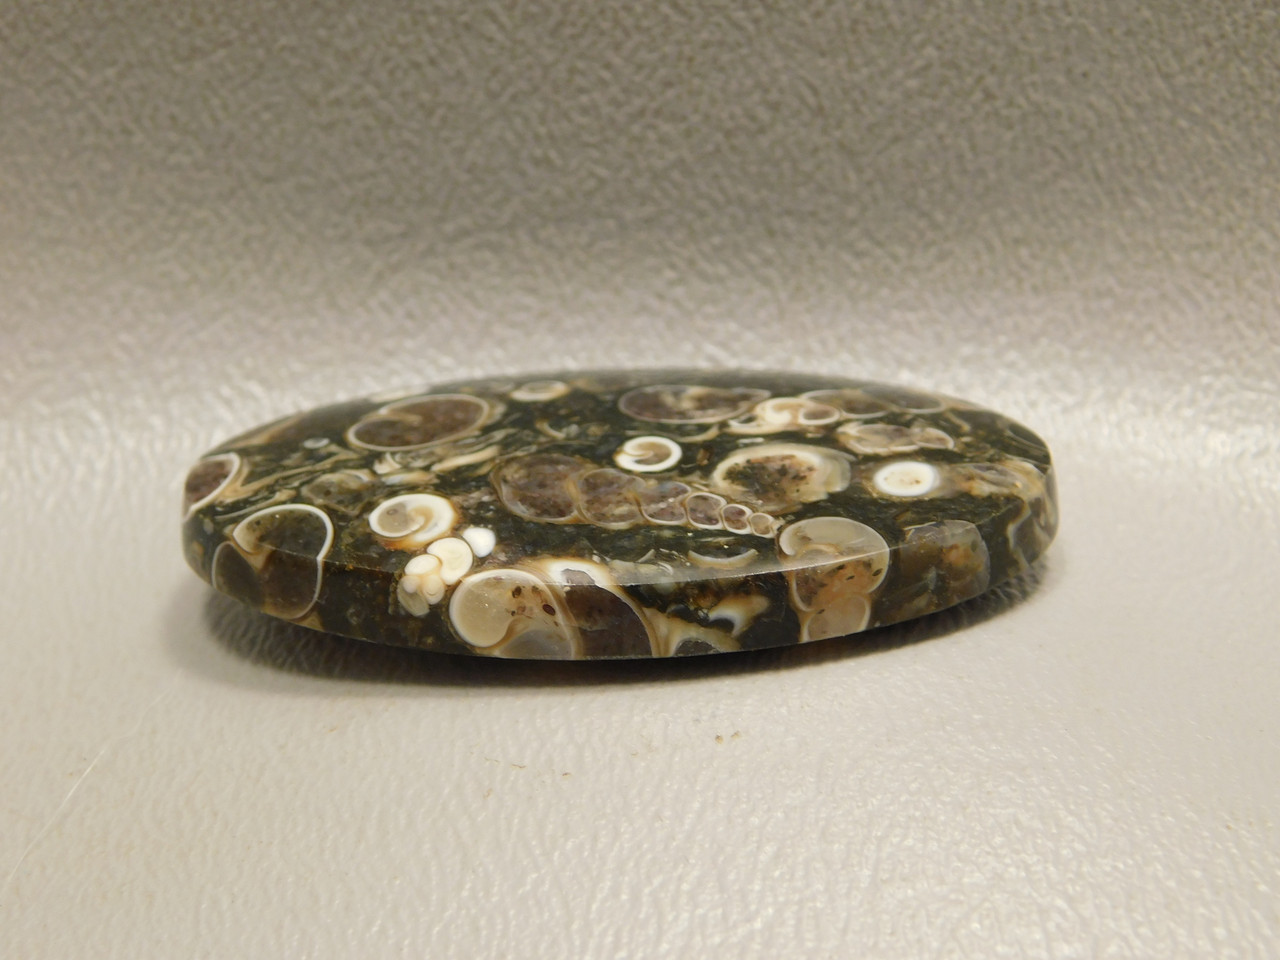 Turritella Agate Semiprecious Gemstone Natural Fossil Cabochon #18